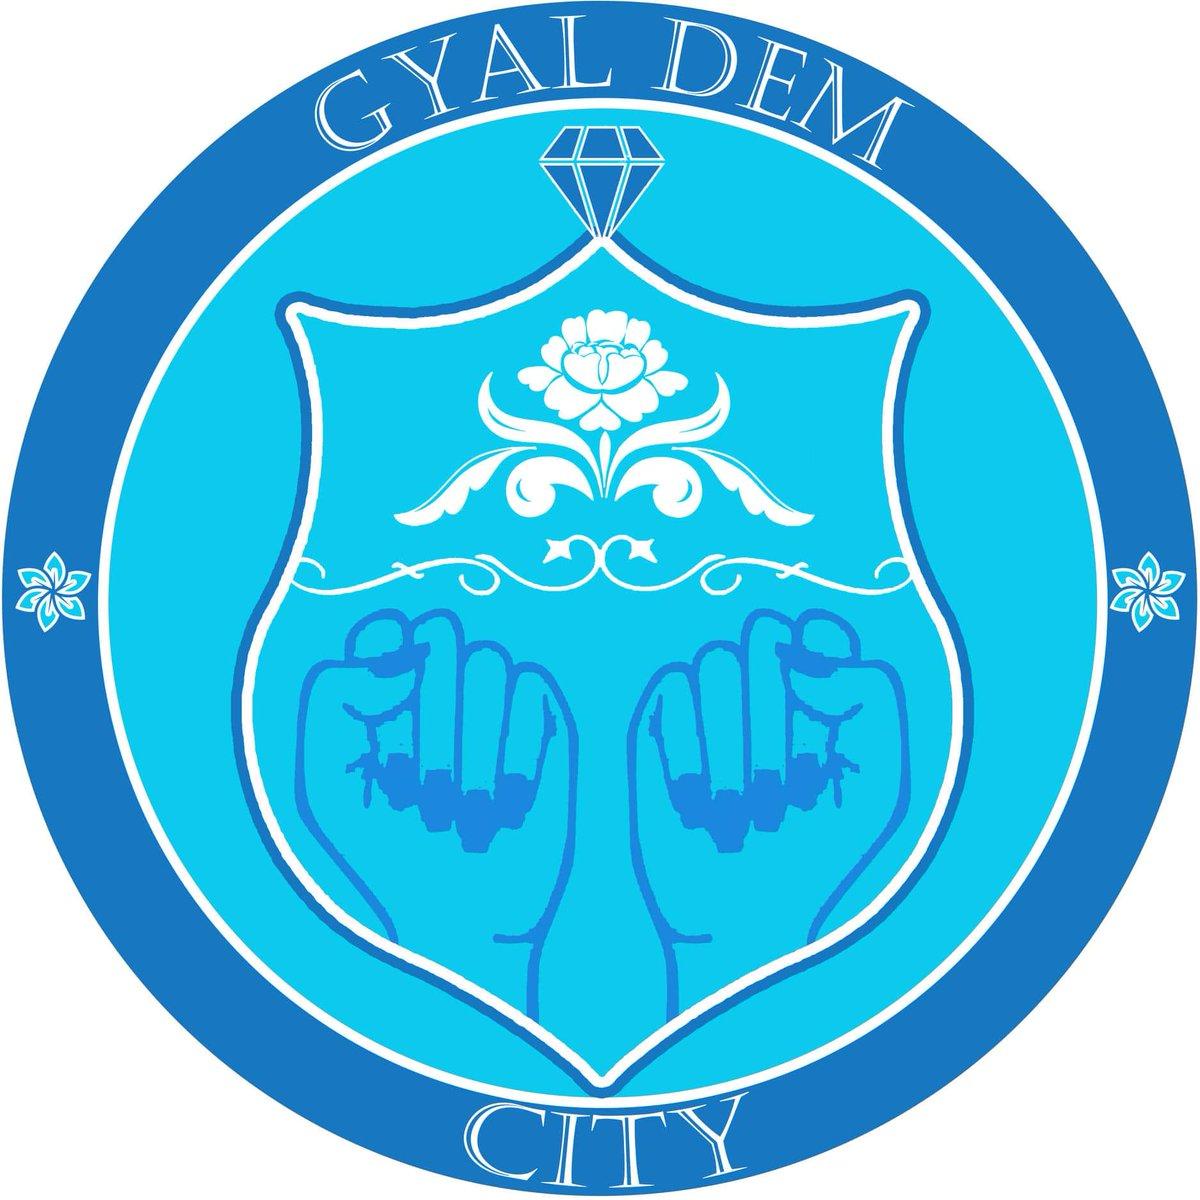 Latest GyalDem City Podcast - MANCHESTER CITY VS CRYSTAL PALACE PREVIEW - BRIGHTON RECAP    Hosts Yan City @Yannickaaa & @RoseMCFC   YouTube - https://t.co/GmwGpQg8OO  SoundCloud - https://t.co/px0CjJnyPt https://t.co/tHY70rgBgr